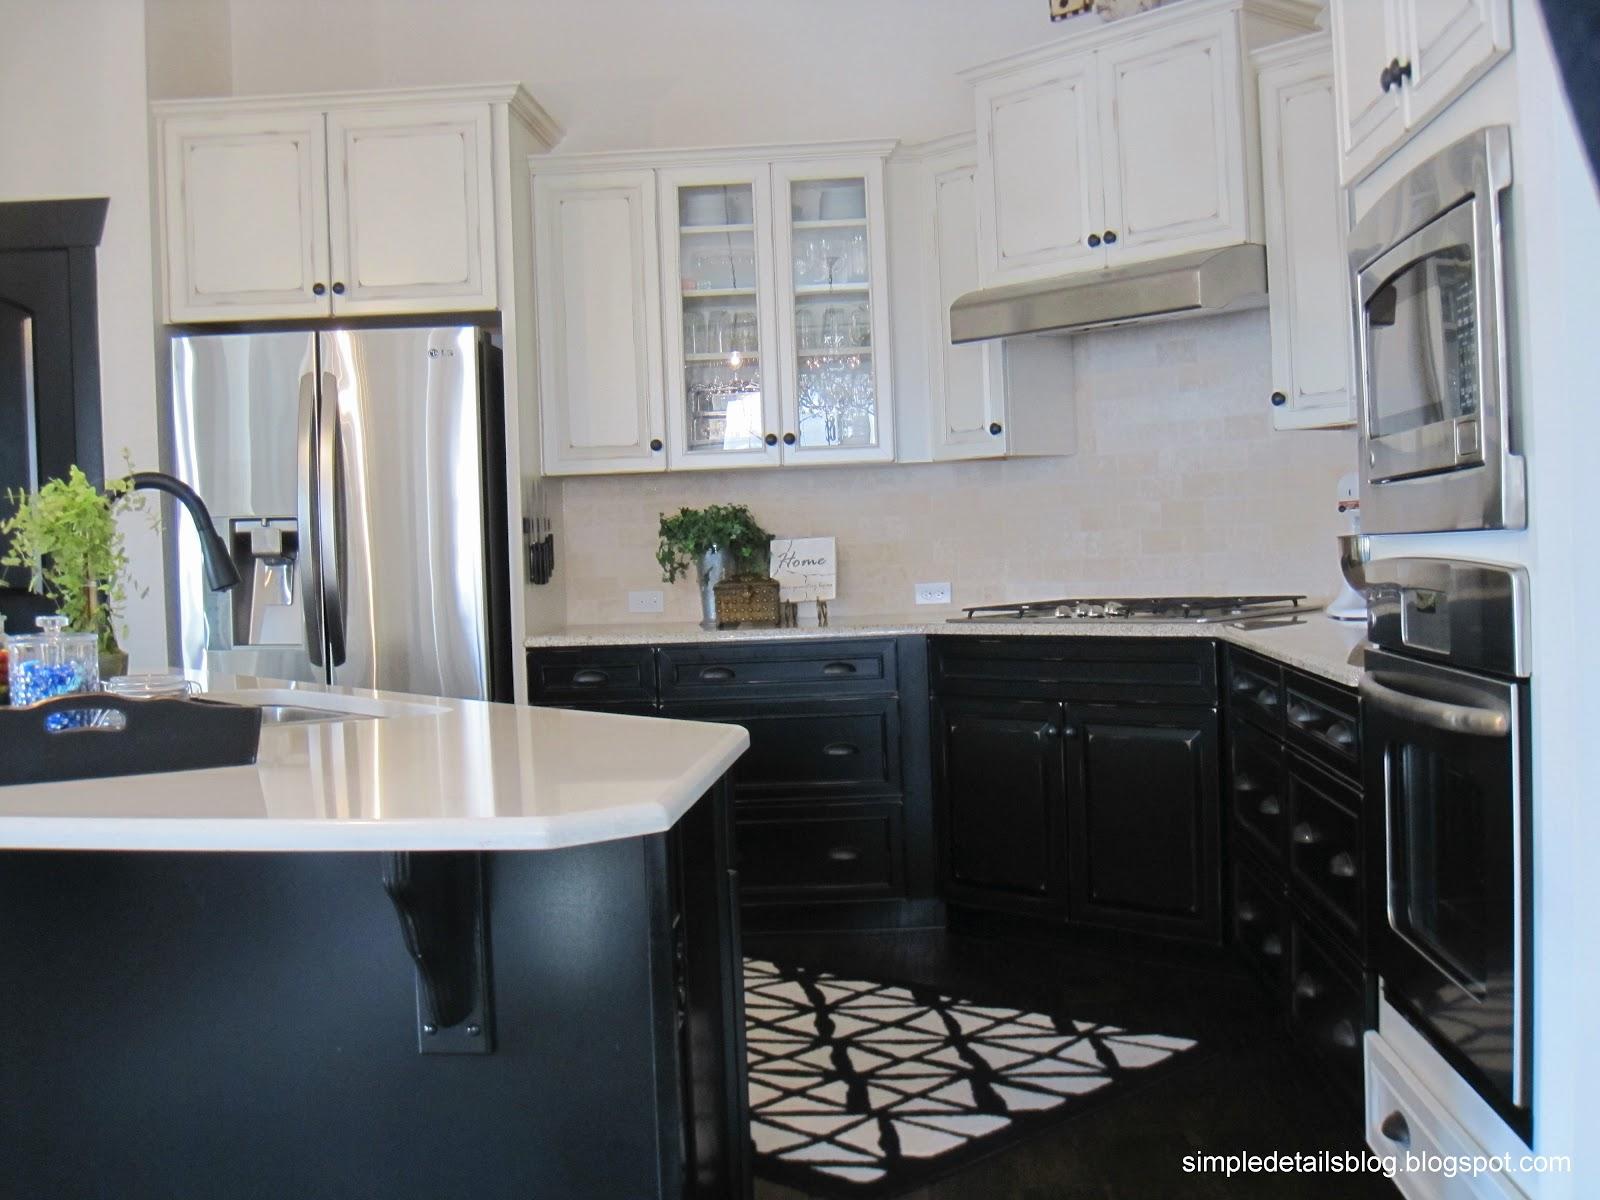 Simple Details: Builder Beige To Black Beauty